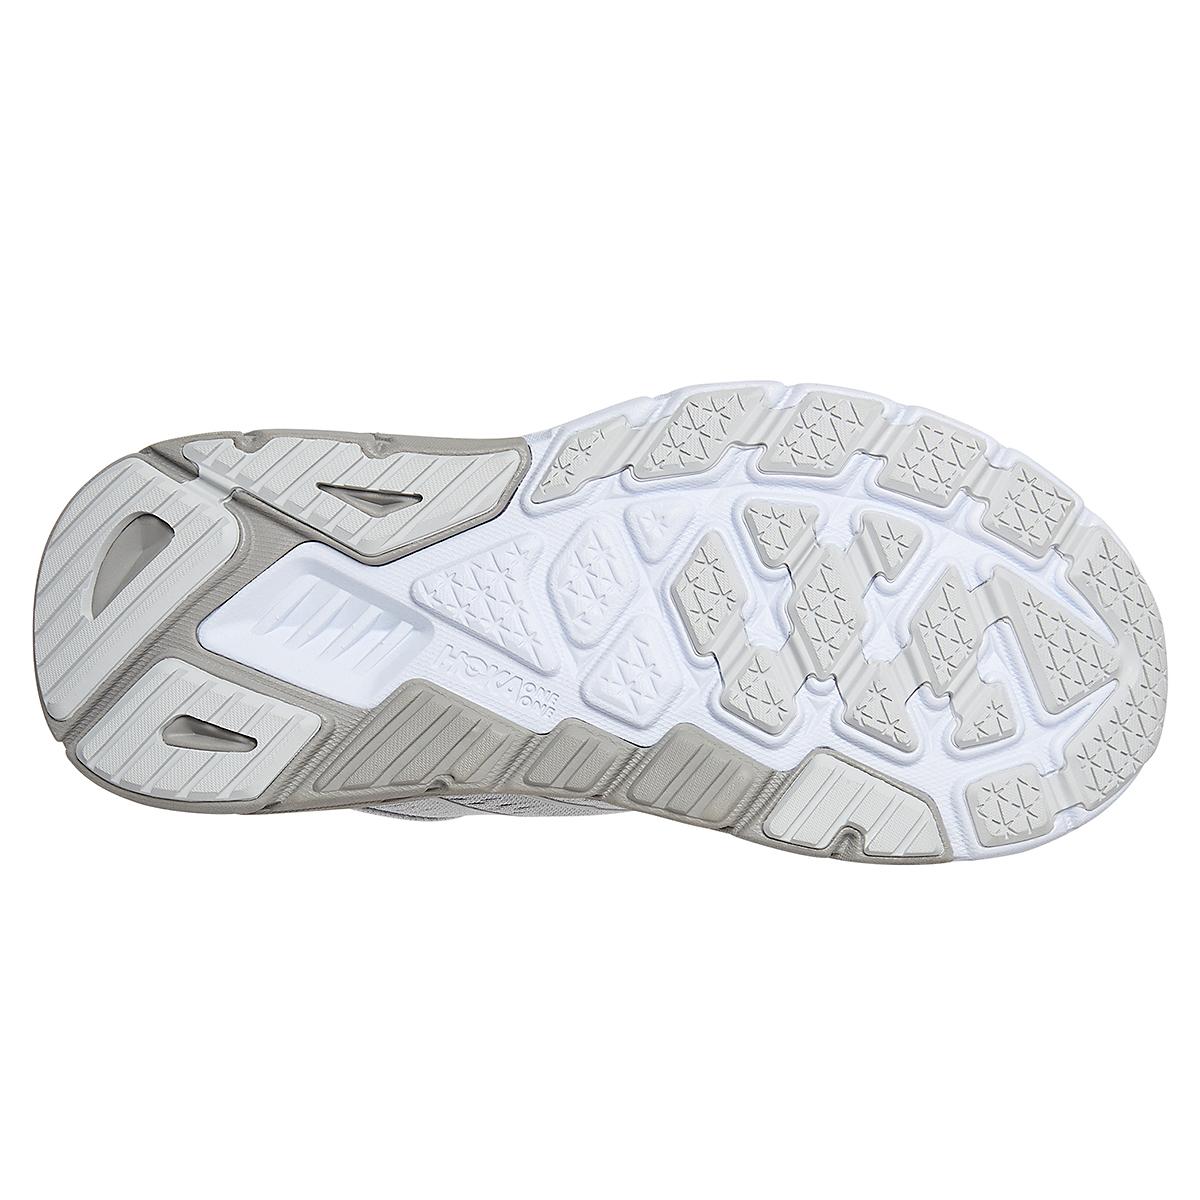 Women's Hoka One One Arahi 5 Running Shoe - Color: Lunar Rock - Size: 5 - Width: Regular, Lunar Rock, large, image 3